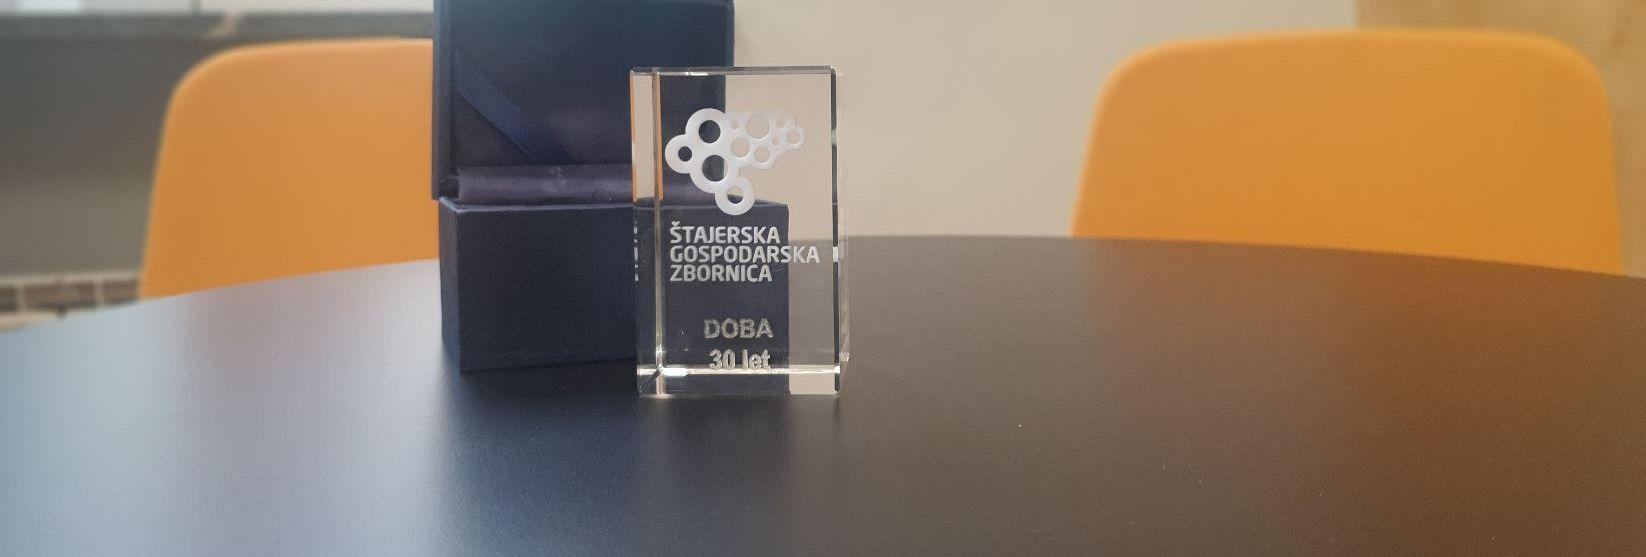 Nagrada Štajerske privredne komore DOBI povodom 30. godišnjice